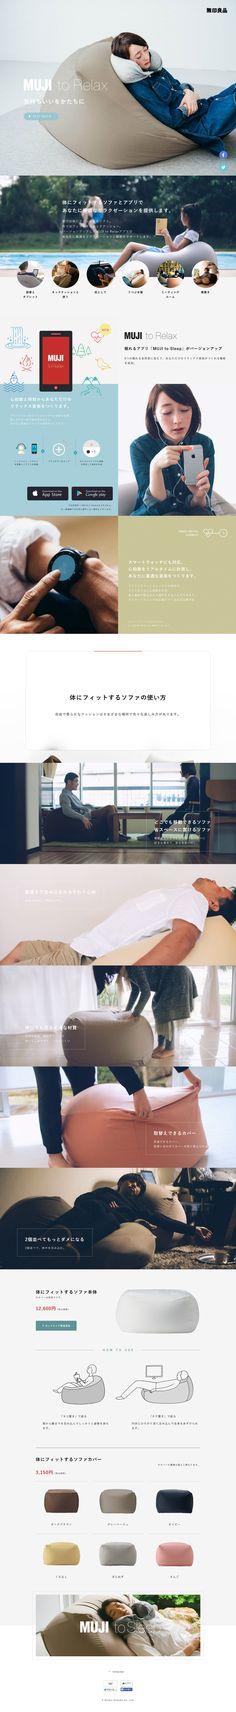 MUJI to Relax. LP、商品詳細